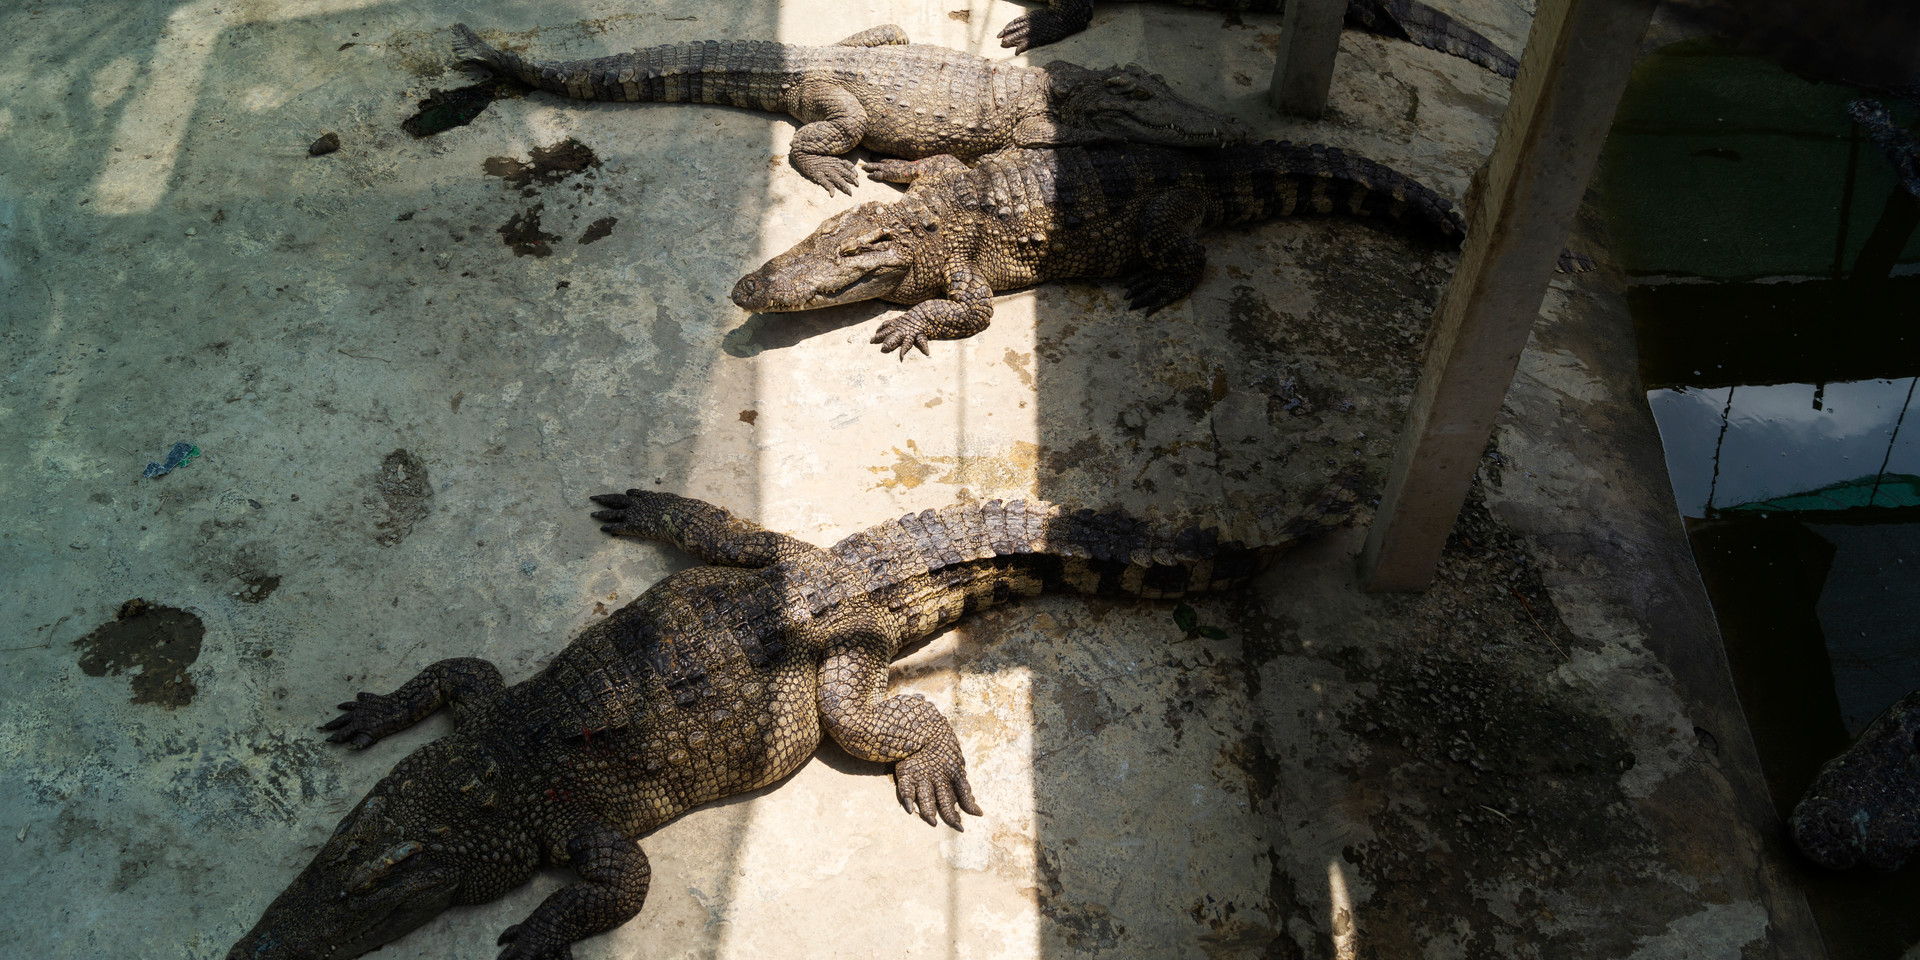 Crocodile Farm, Battambang Province